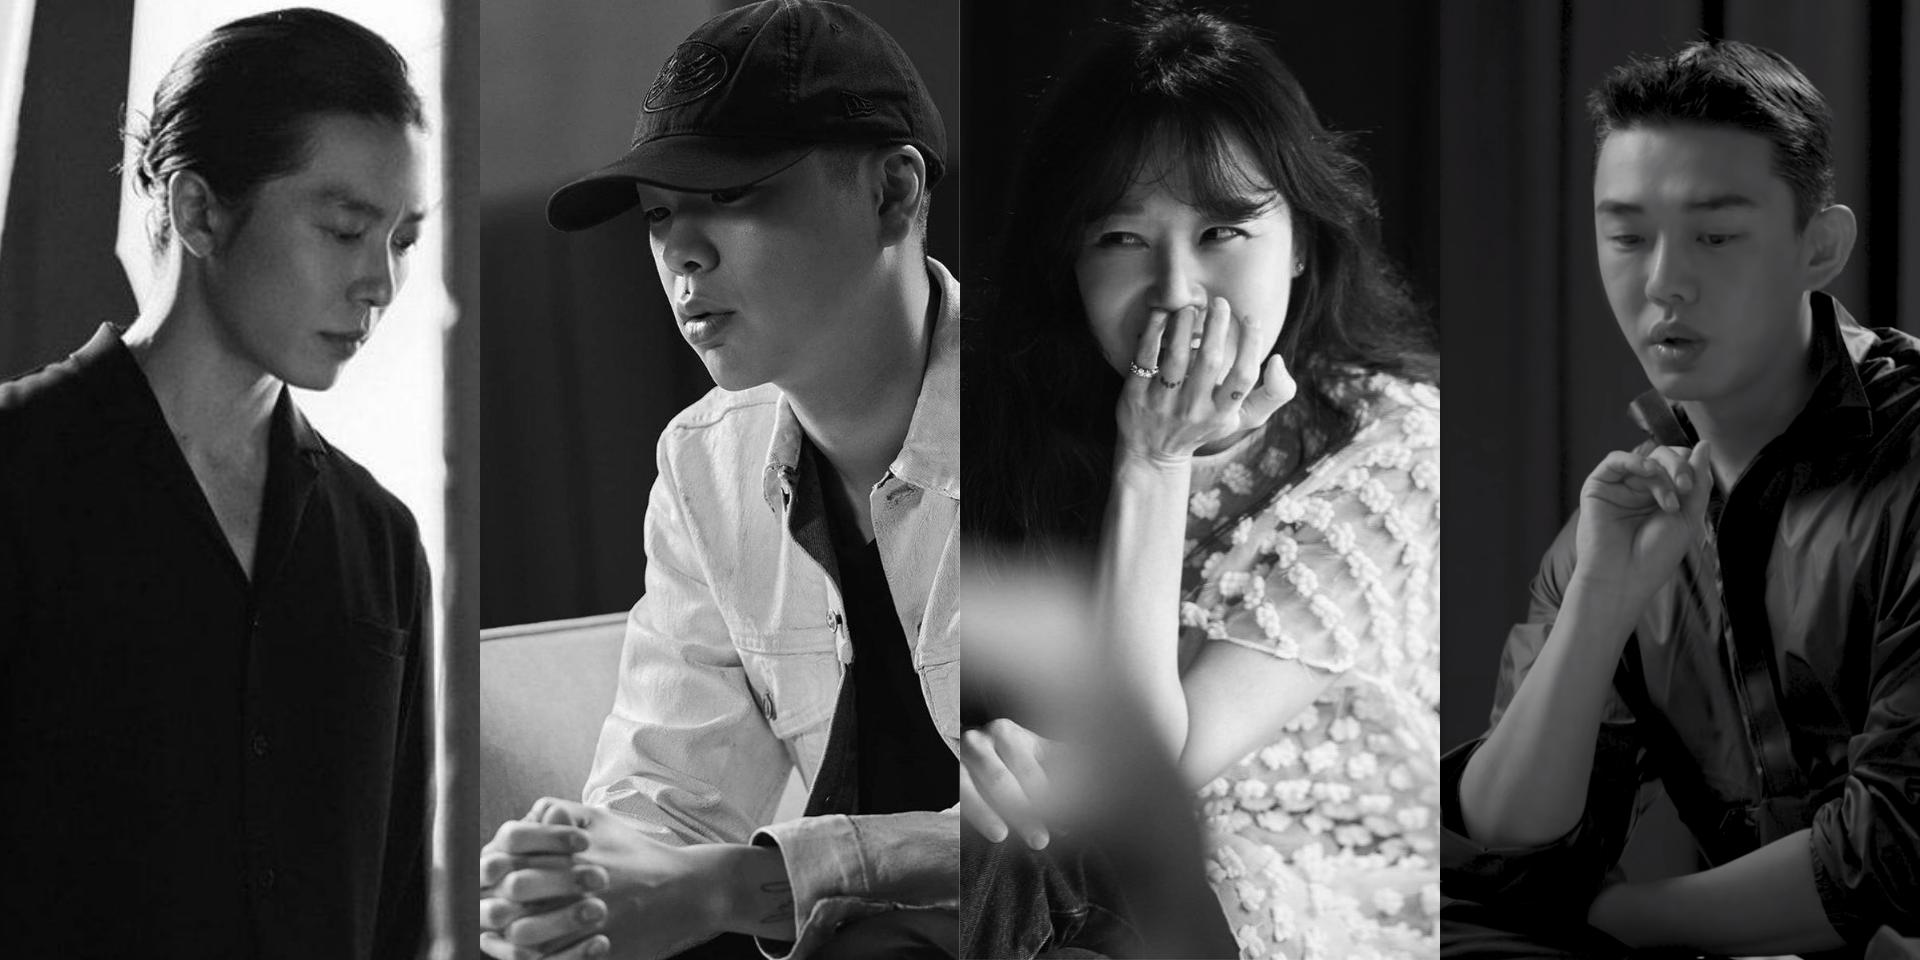 Hyukoh vocalist Oh Hyuk, Burning actor Yoo Ah-In, and more featured in Kim Jae Wook's My Margiela video series